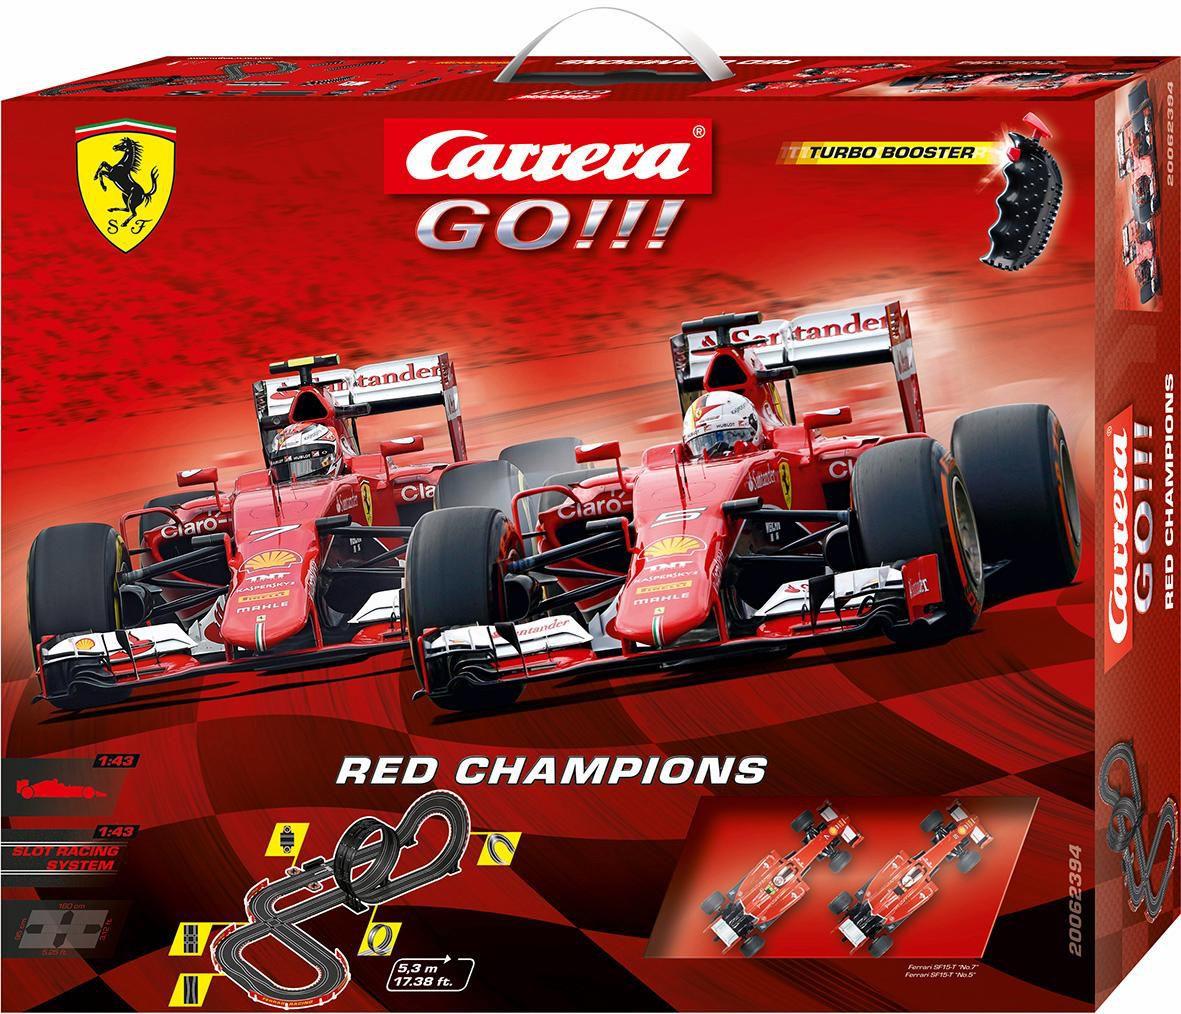 CARRERA Carrera Autorennbahn, »Carrera® GO!!!, Red Champions«